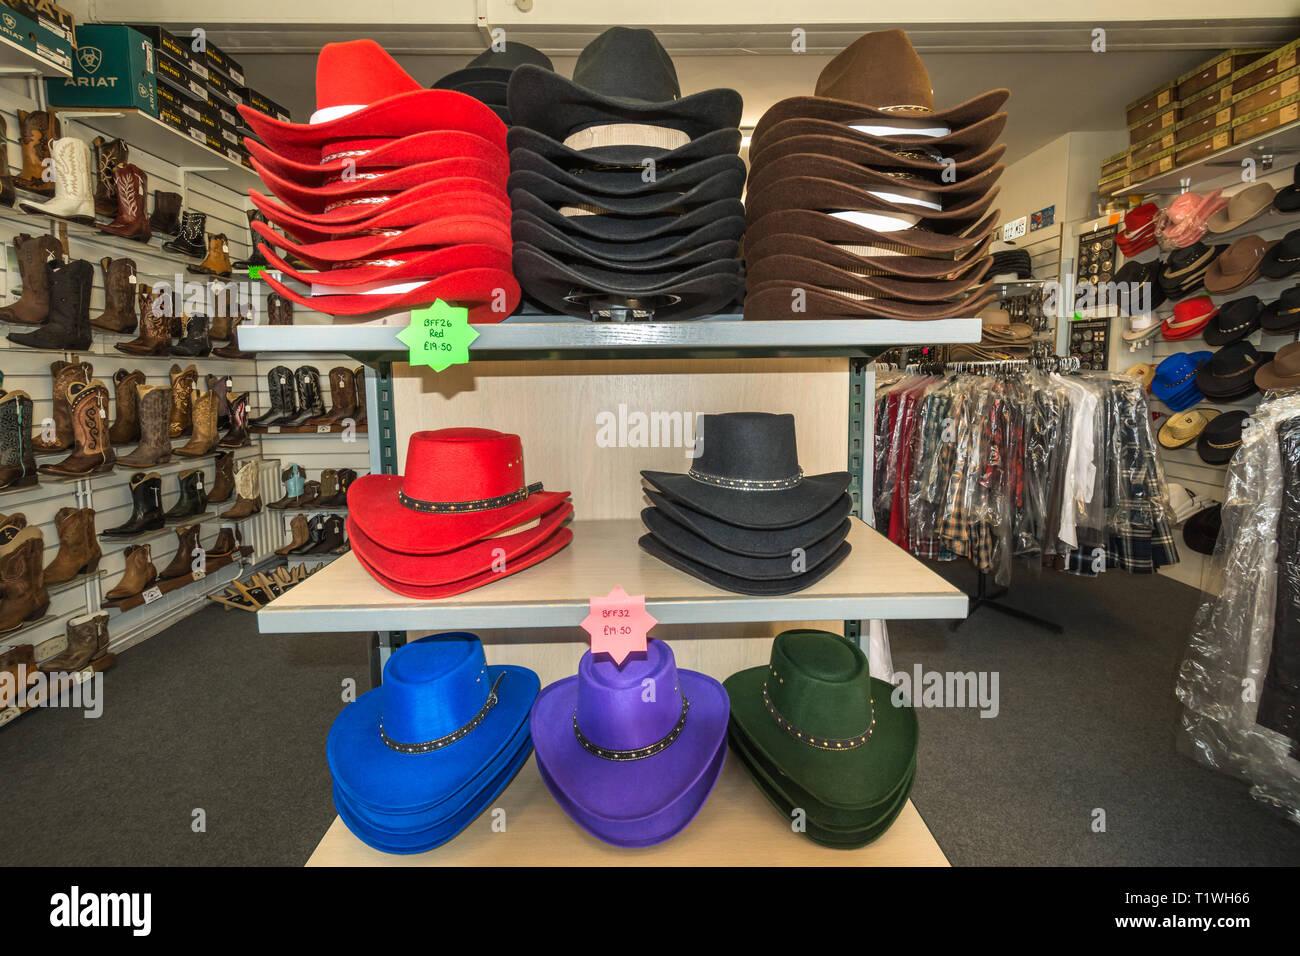 b7fcfea5383fc Interior of the Wild Wild Western Wear specialist shop in Farnborough